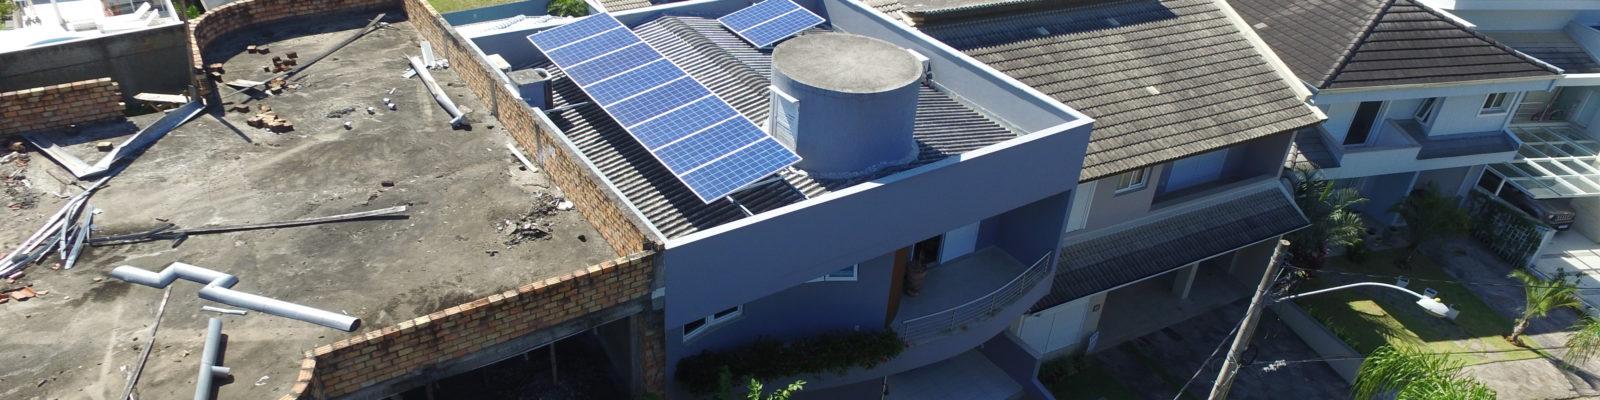 Sistema fotovoltaico na zona sul de POA